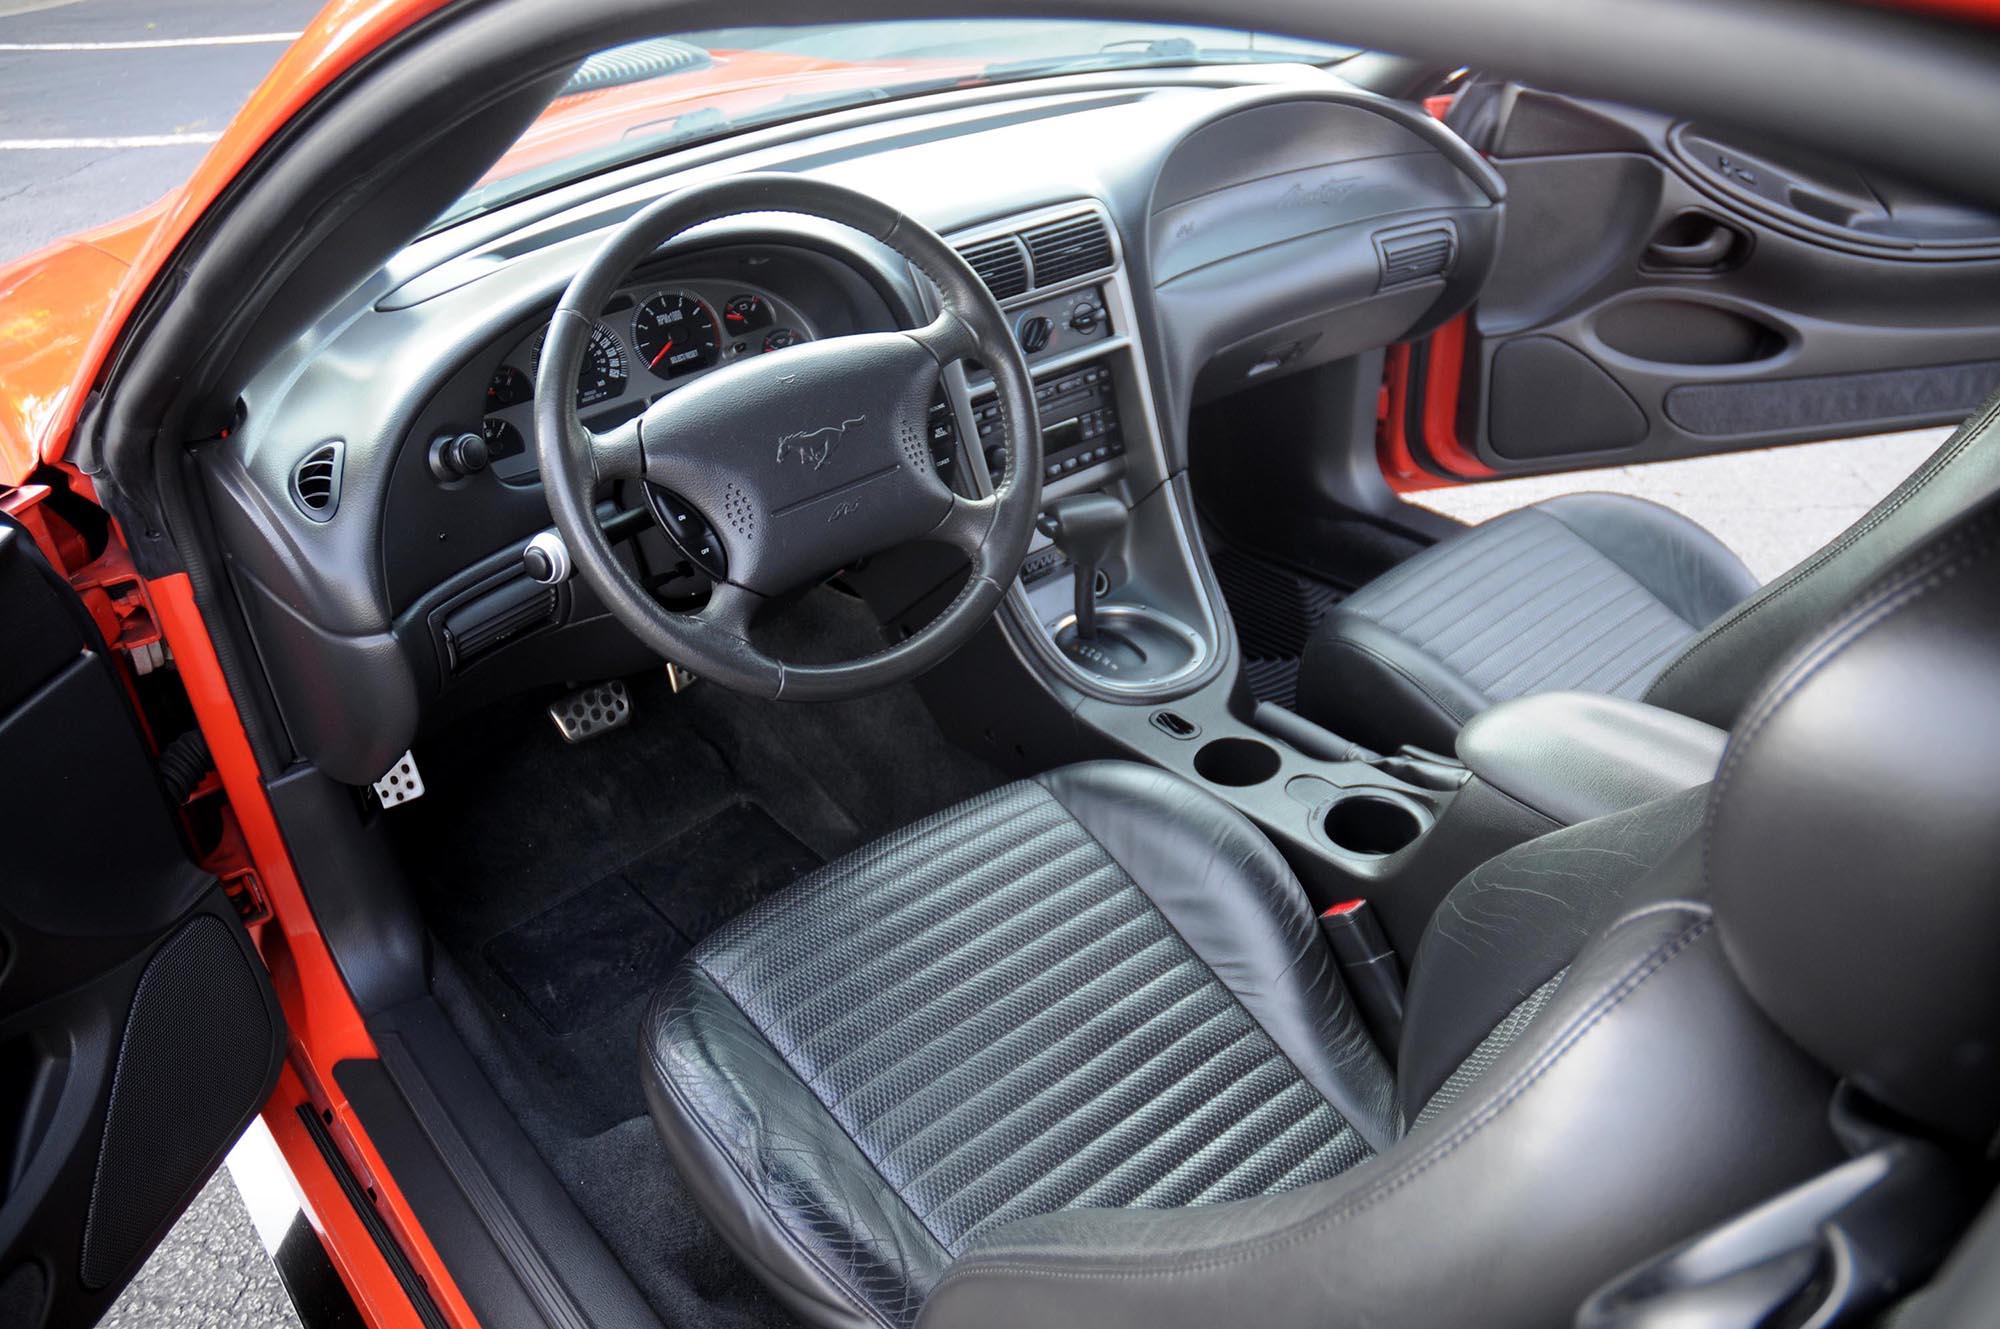 2004 Mustang Mach 1 interior